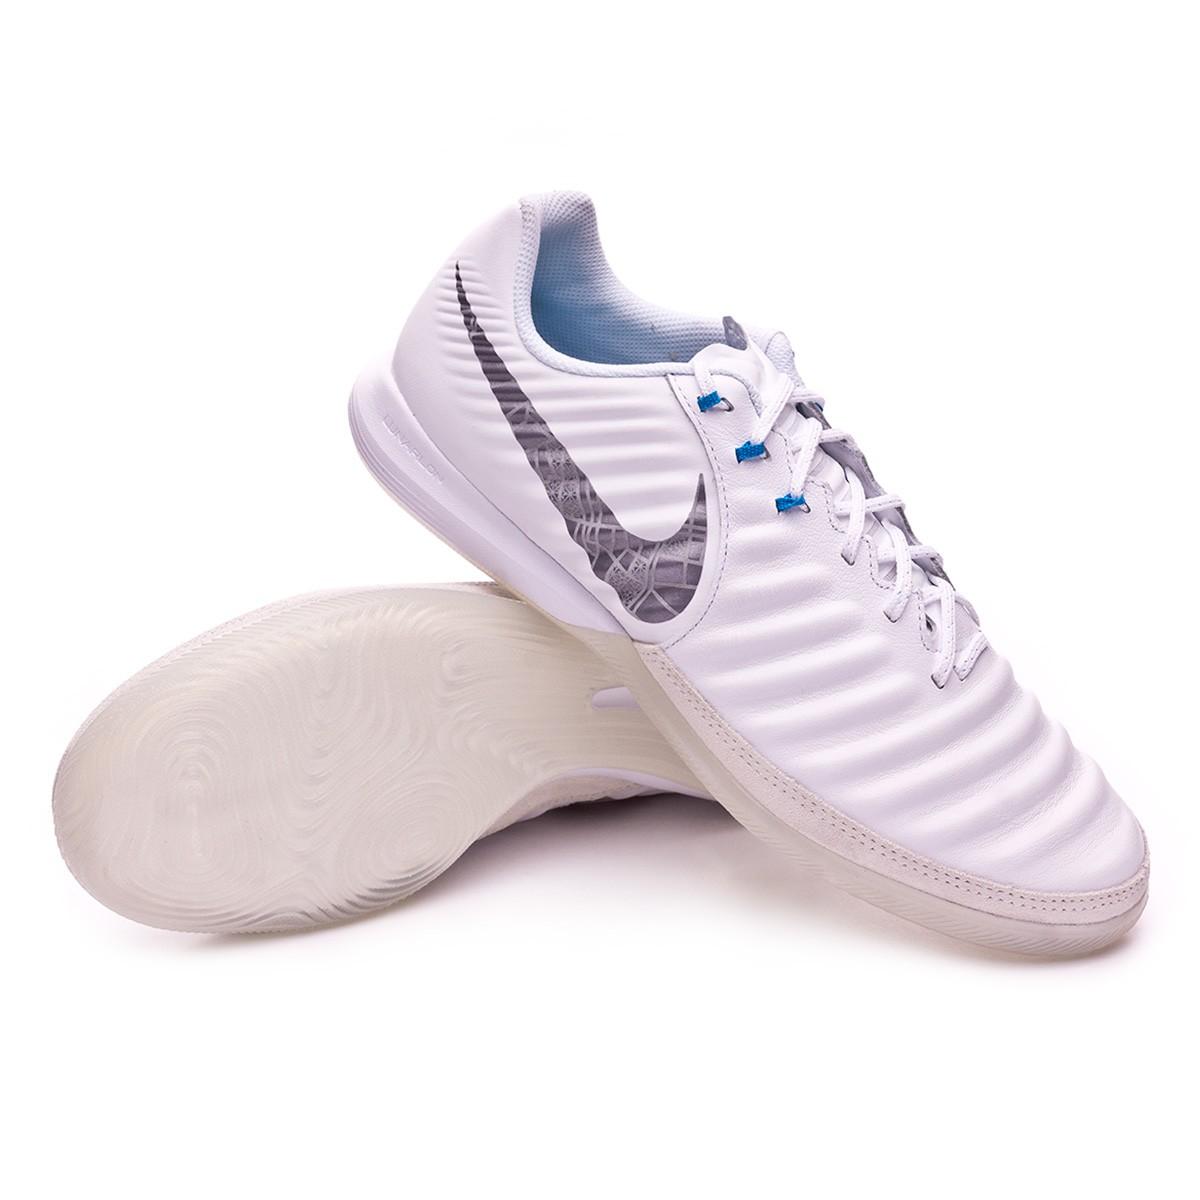 5a9818208e0 Sapatilha de Futsal Nike Tiempo Lunar LegendX VII Pro IC White ...